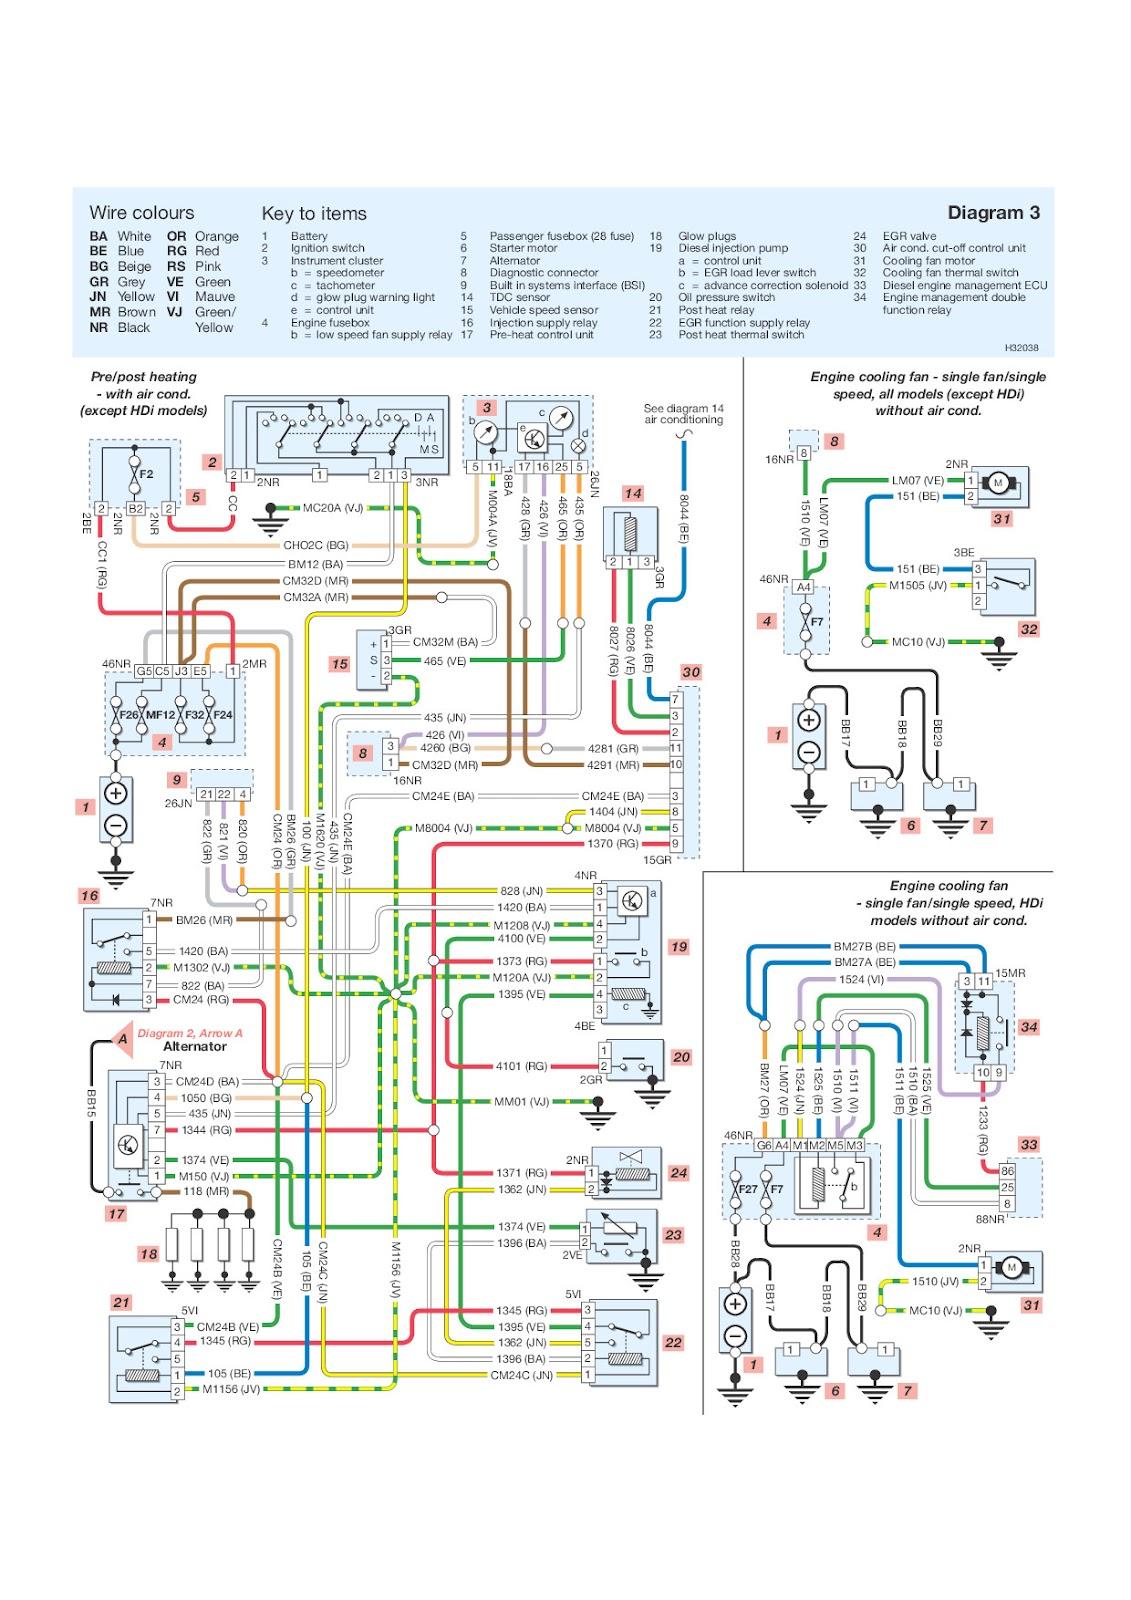 Surprising peugeot 7 abs wiring diagram ideas best image engine peugeot 7 abs wiring diagram asfbconference2016 Gallery